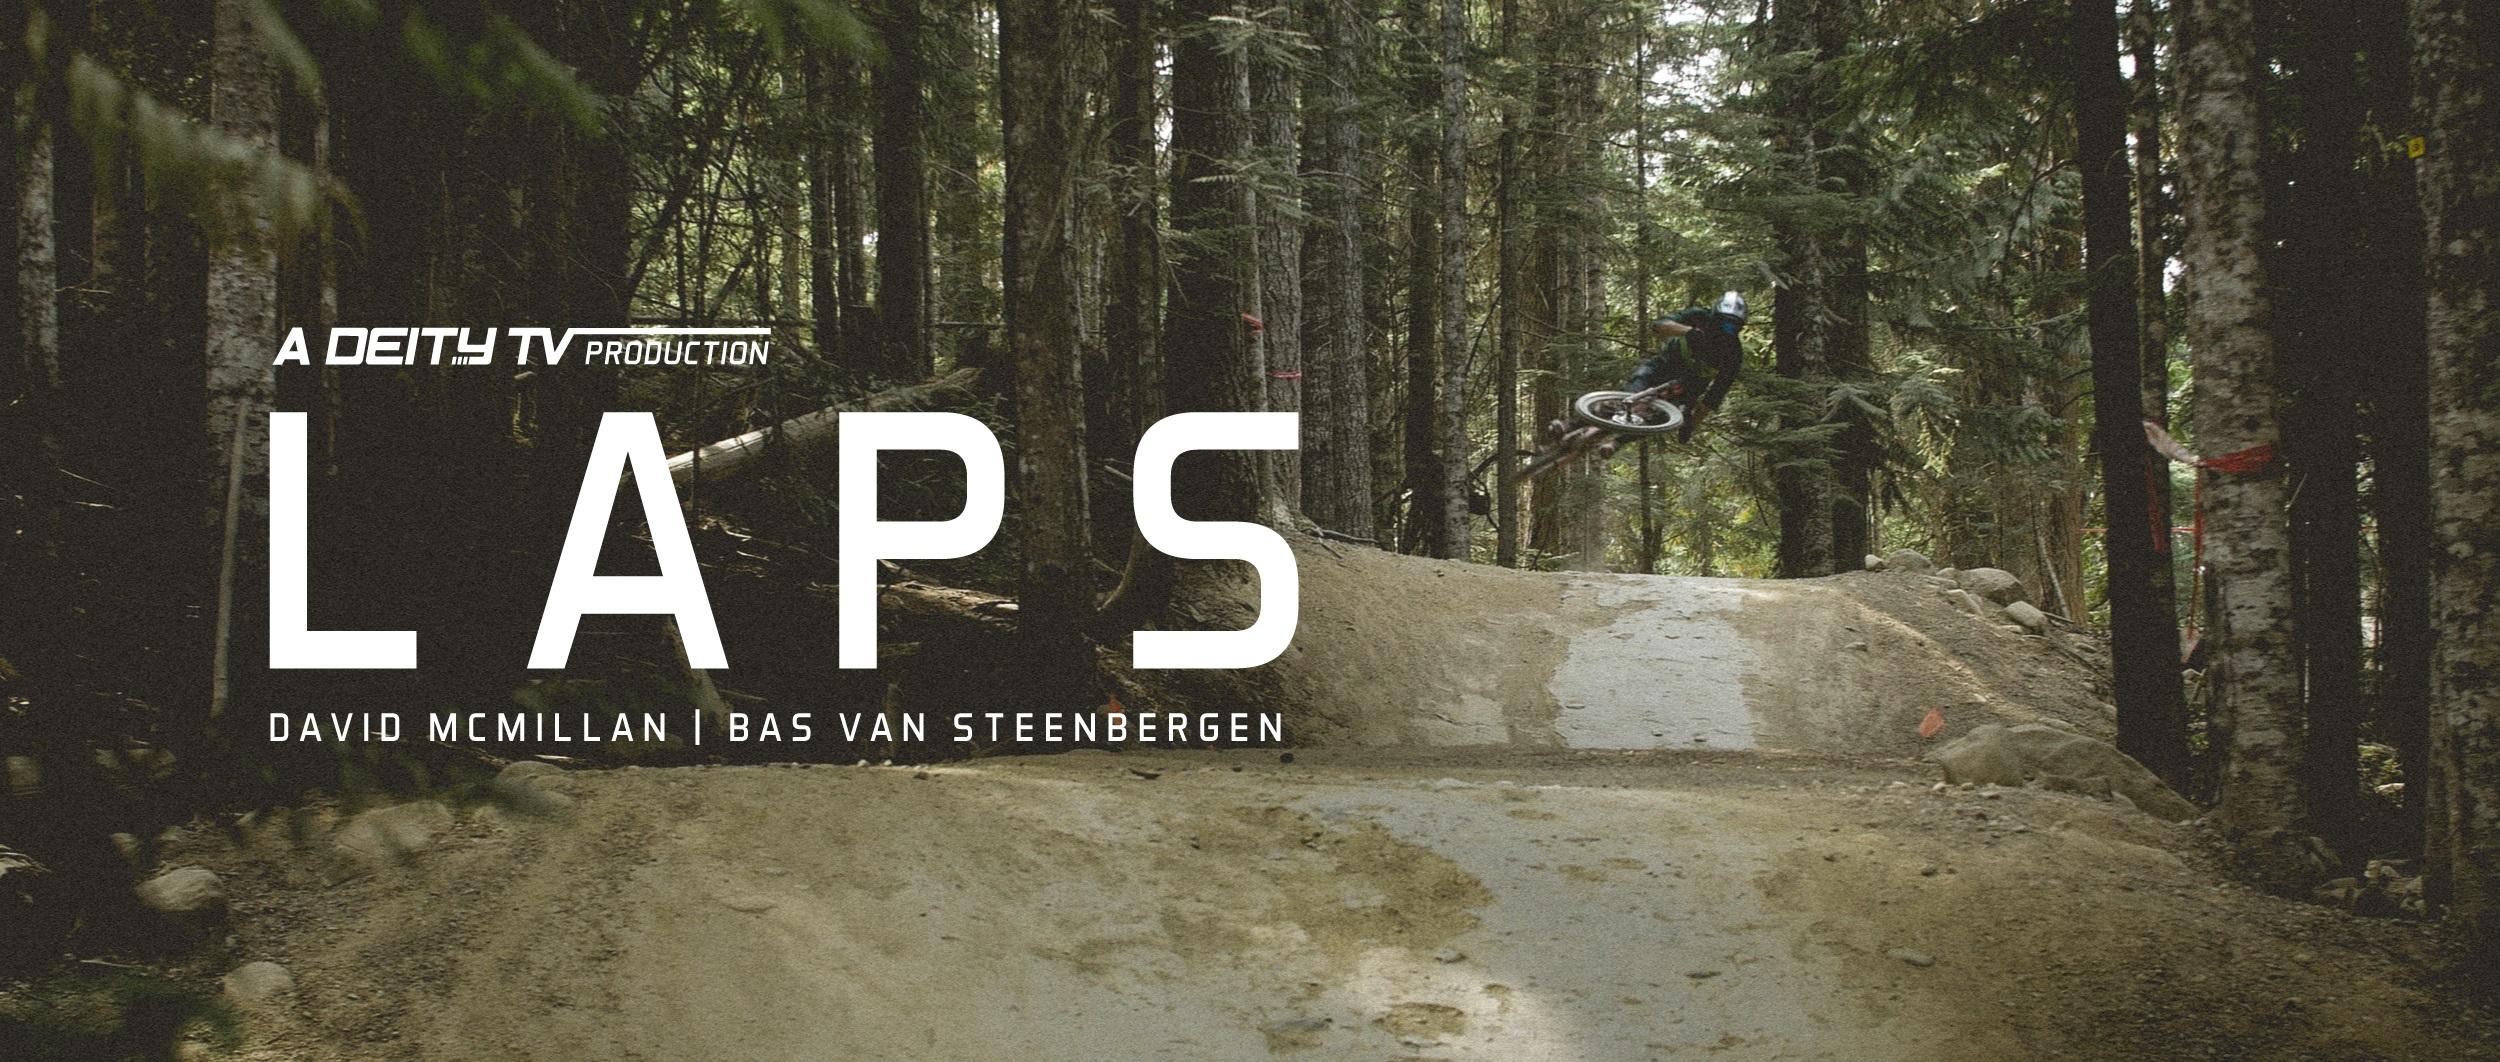 , DEITY edit: LAPS featuring David McMillan and Bas van Steenbergen